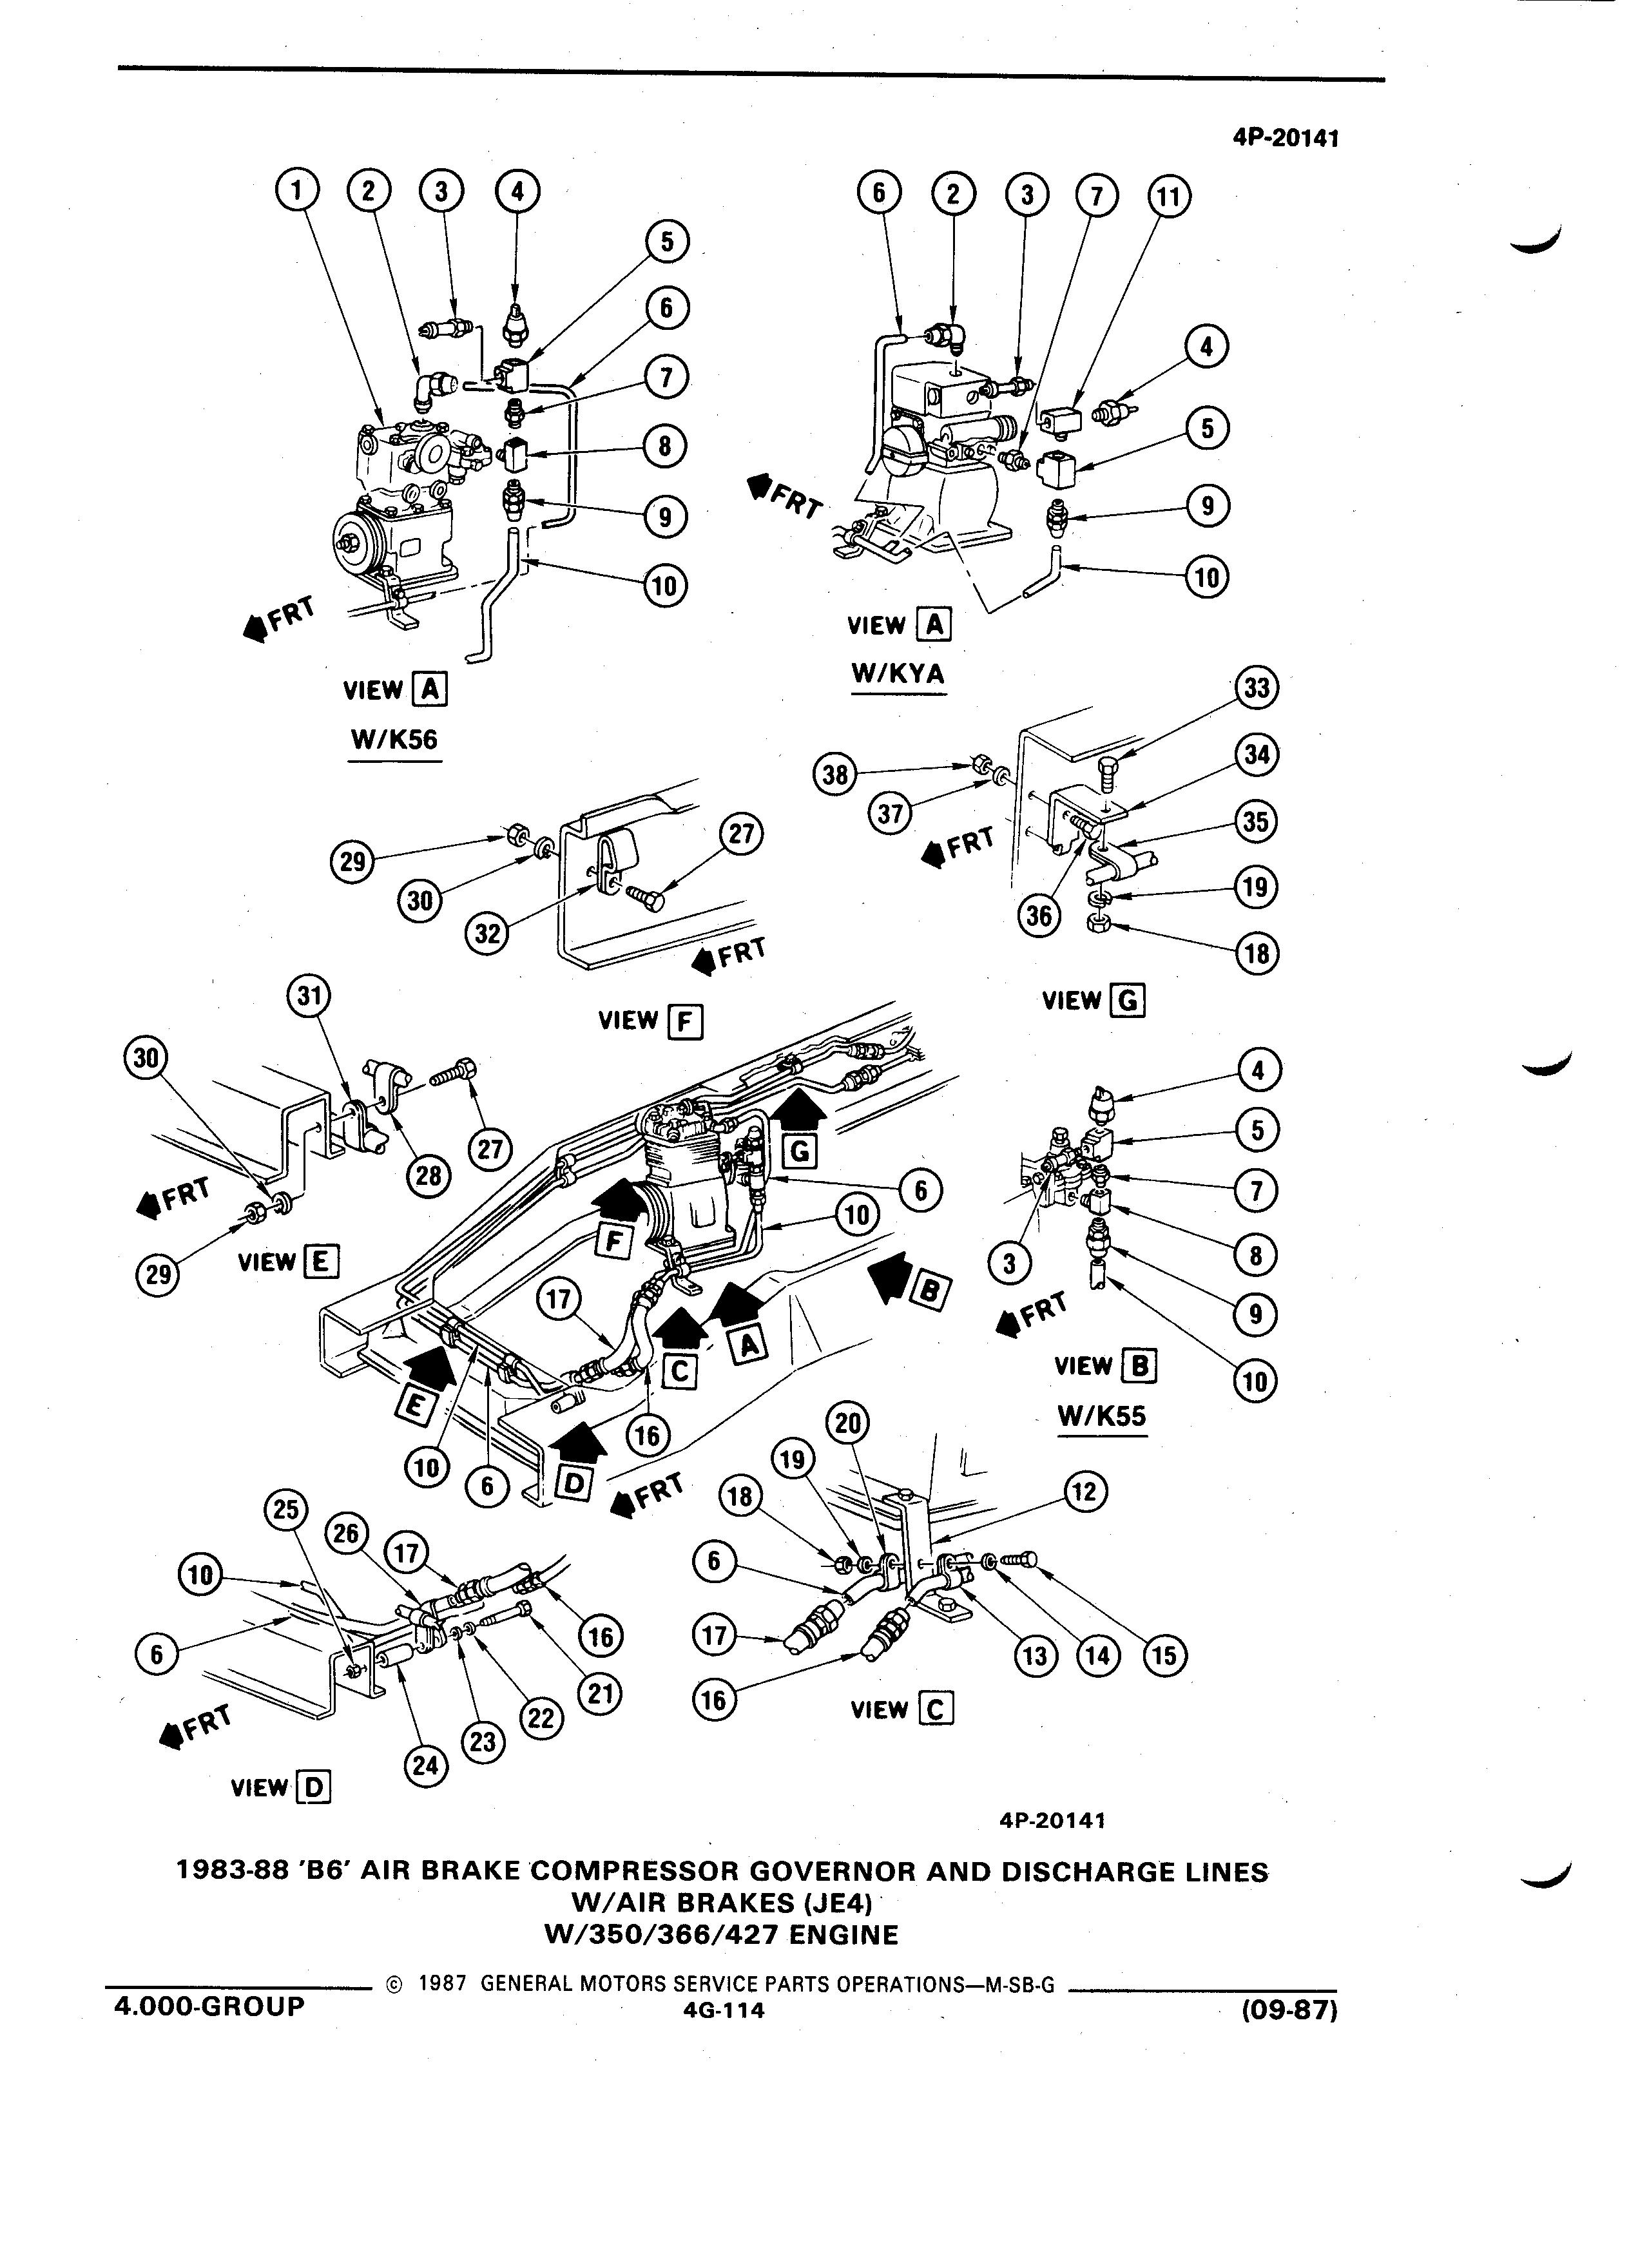 Gmpartswiki Parts And Illustration Catalog M Sb September 1987 427 Engine Diagram